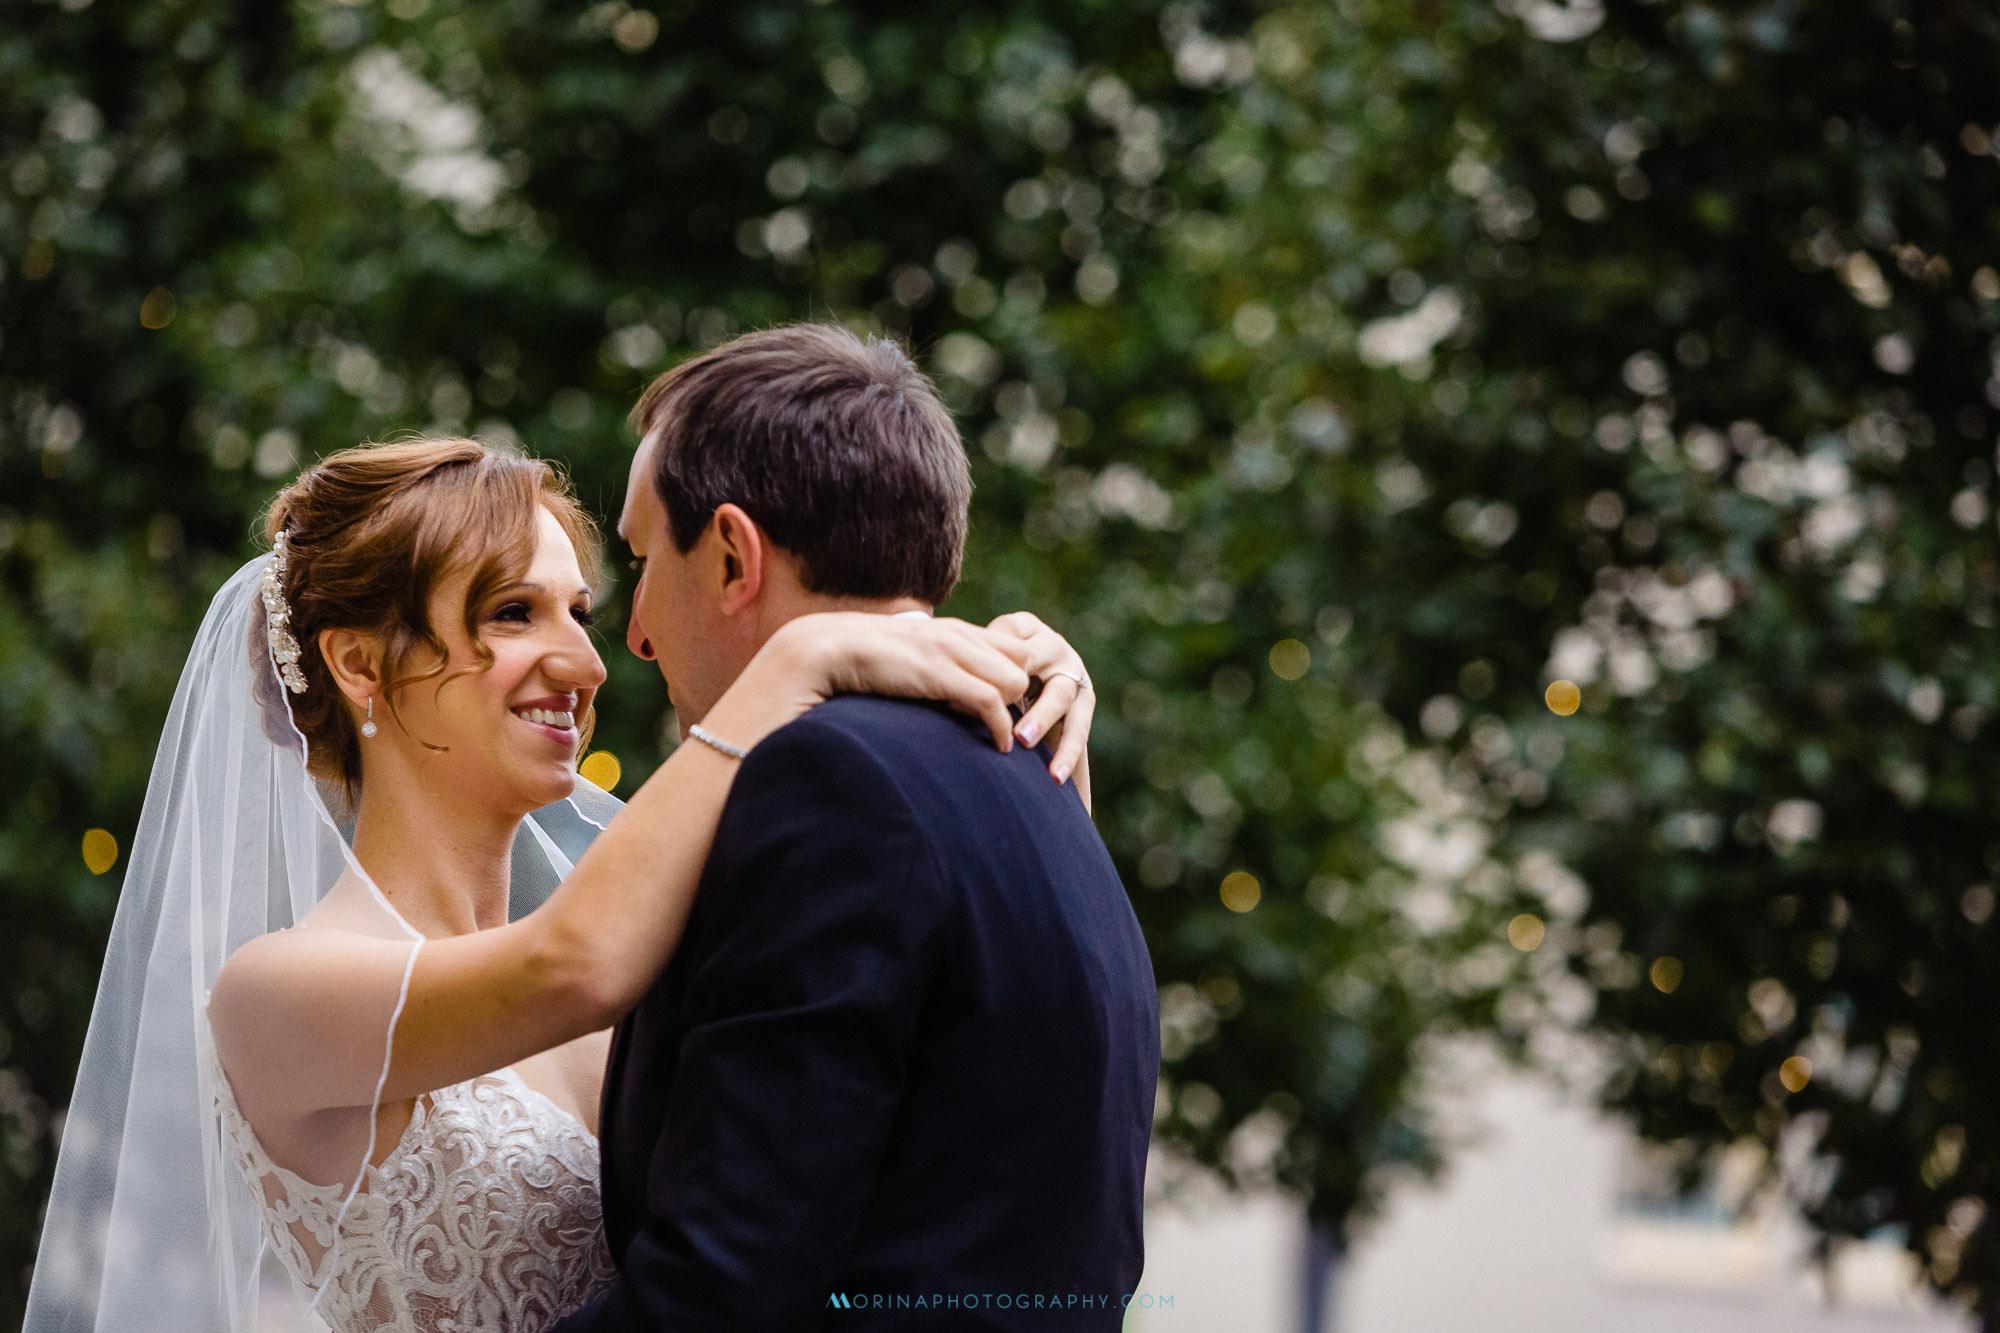 Ilhana & Jonathan Wedding at Vault 634 - Allentown 0041.jpg